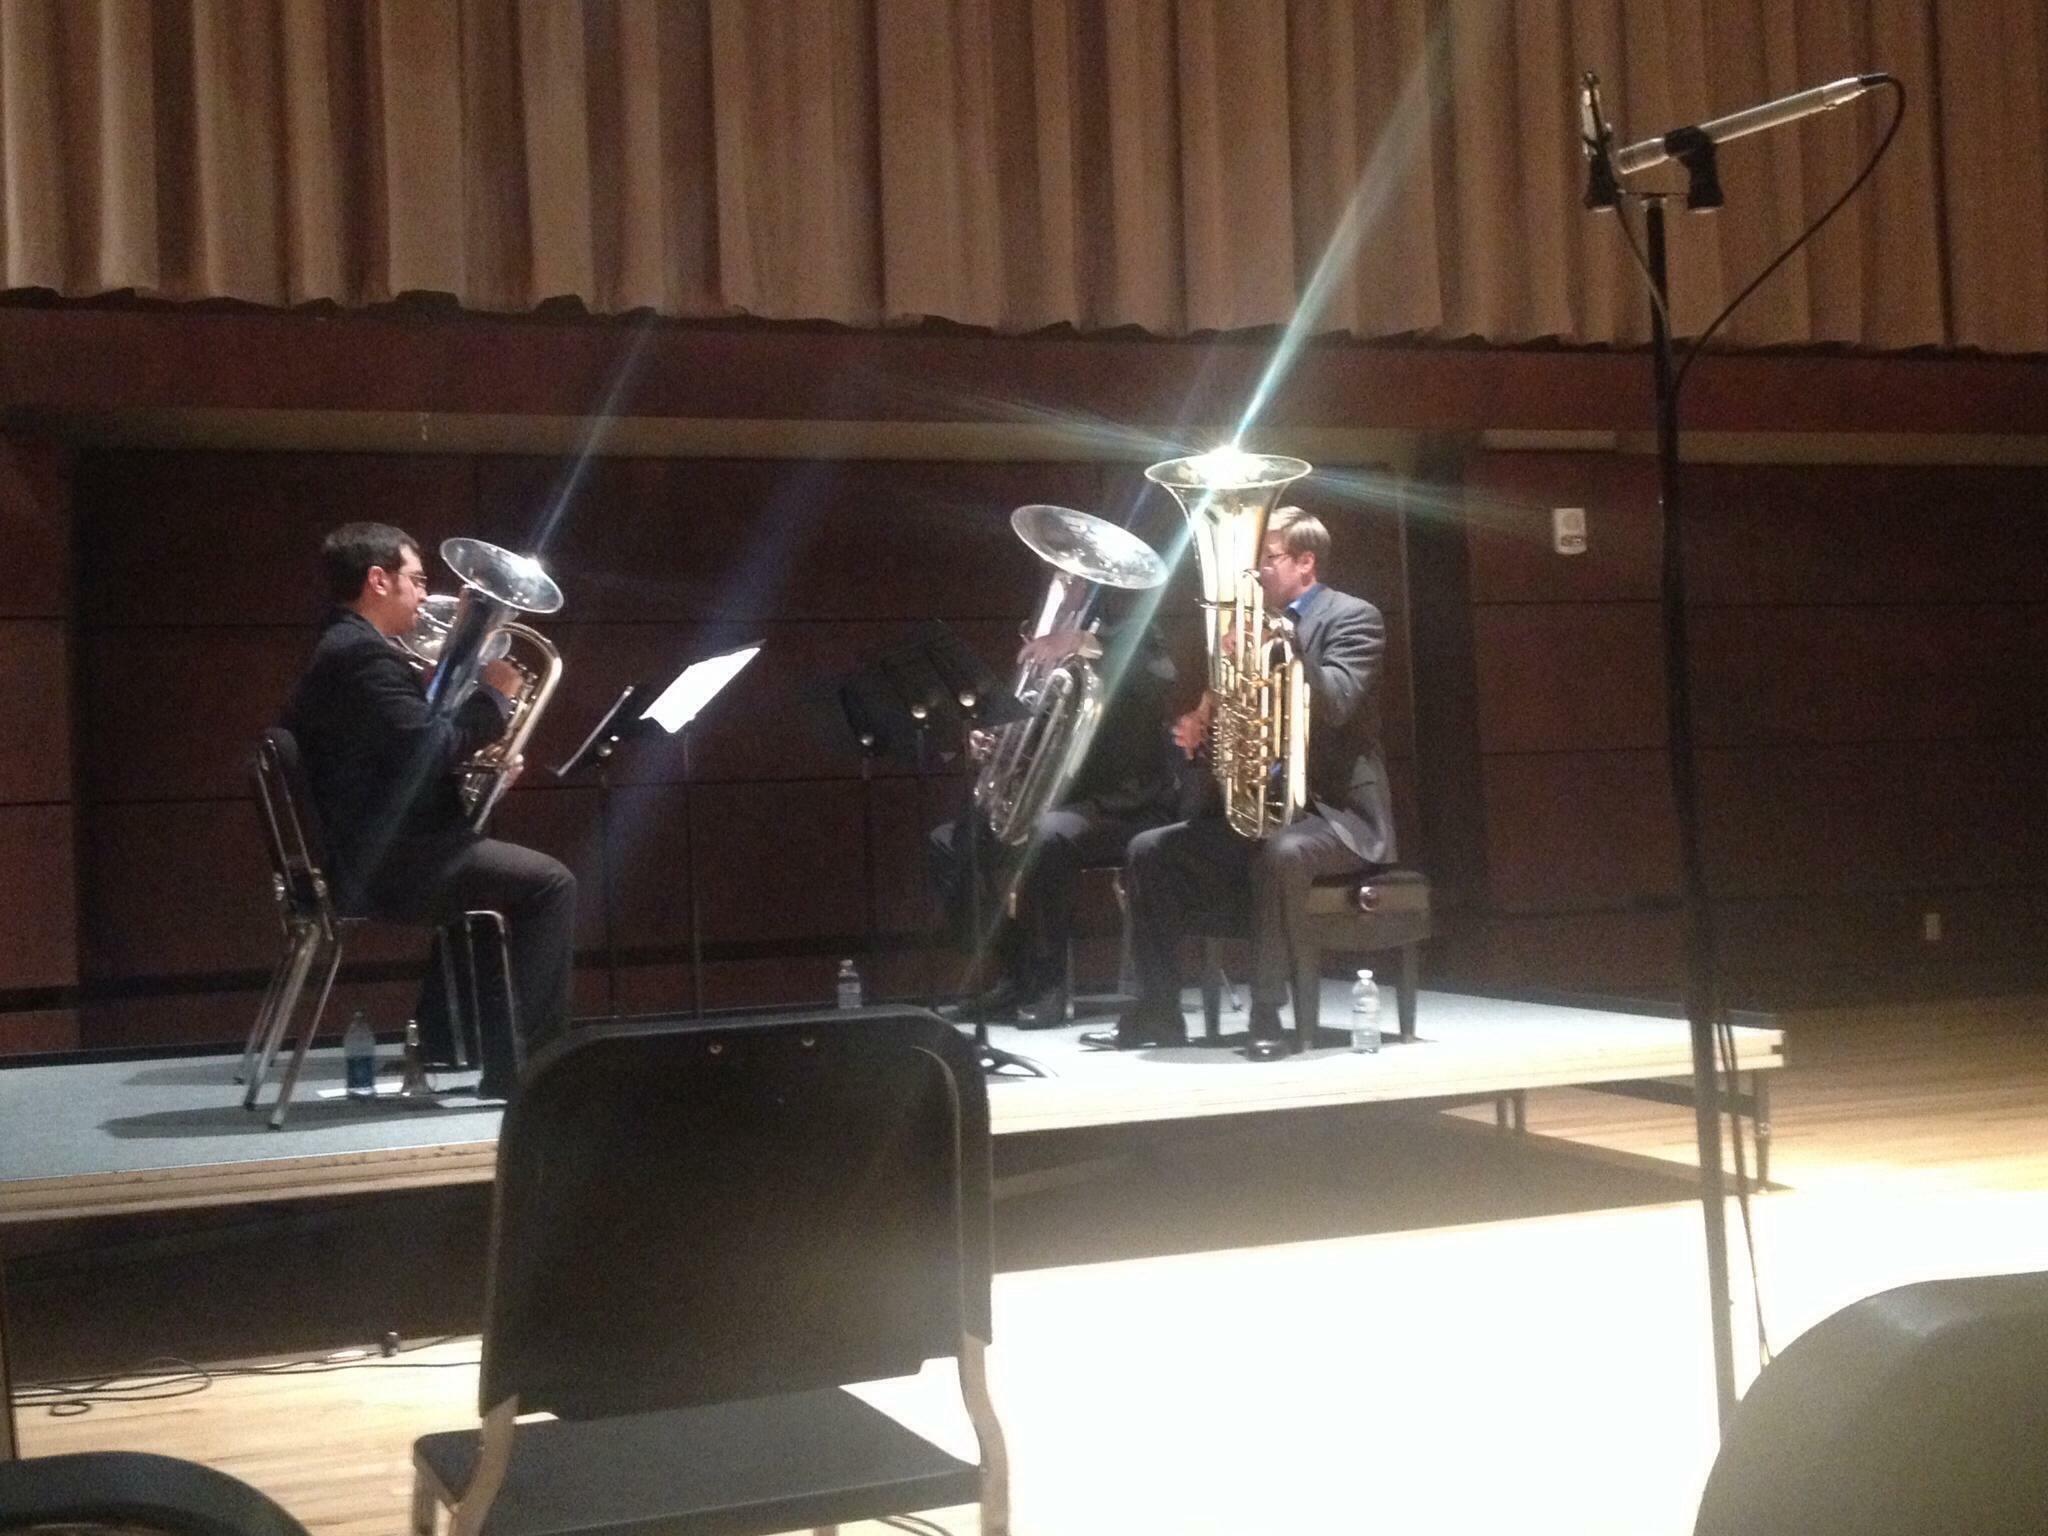 Founders Quartet recital at OCU with Jamie Lipton, Danny Chapa, and Steve Kunzer.